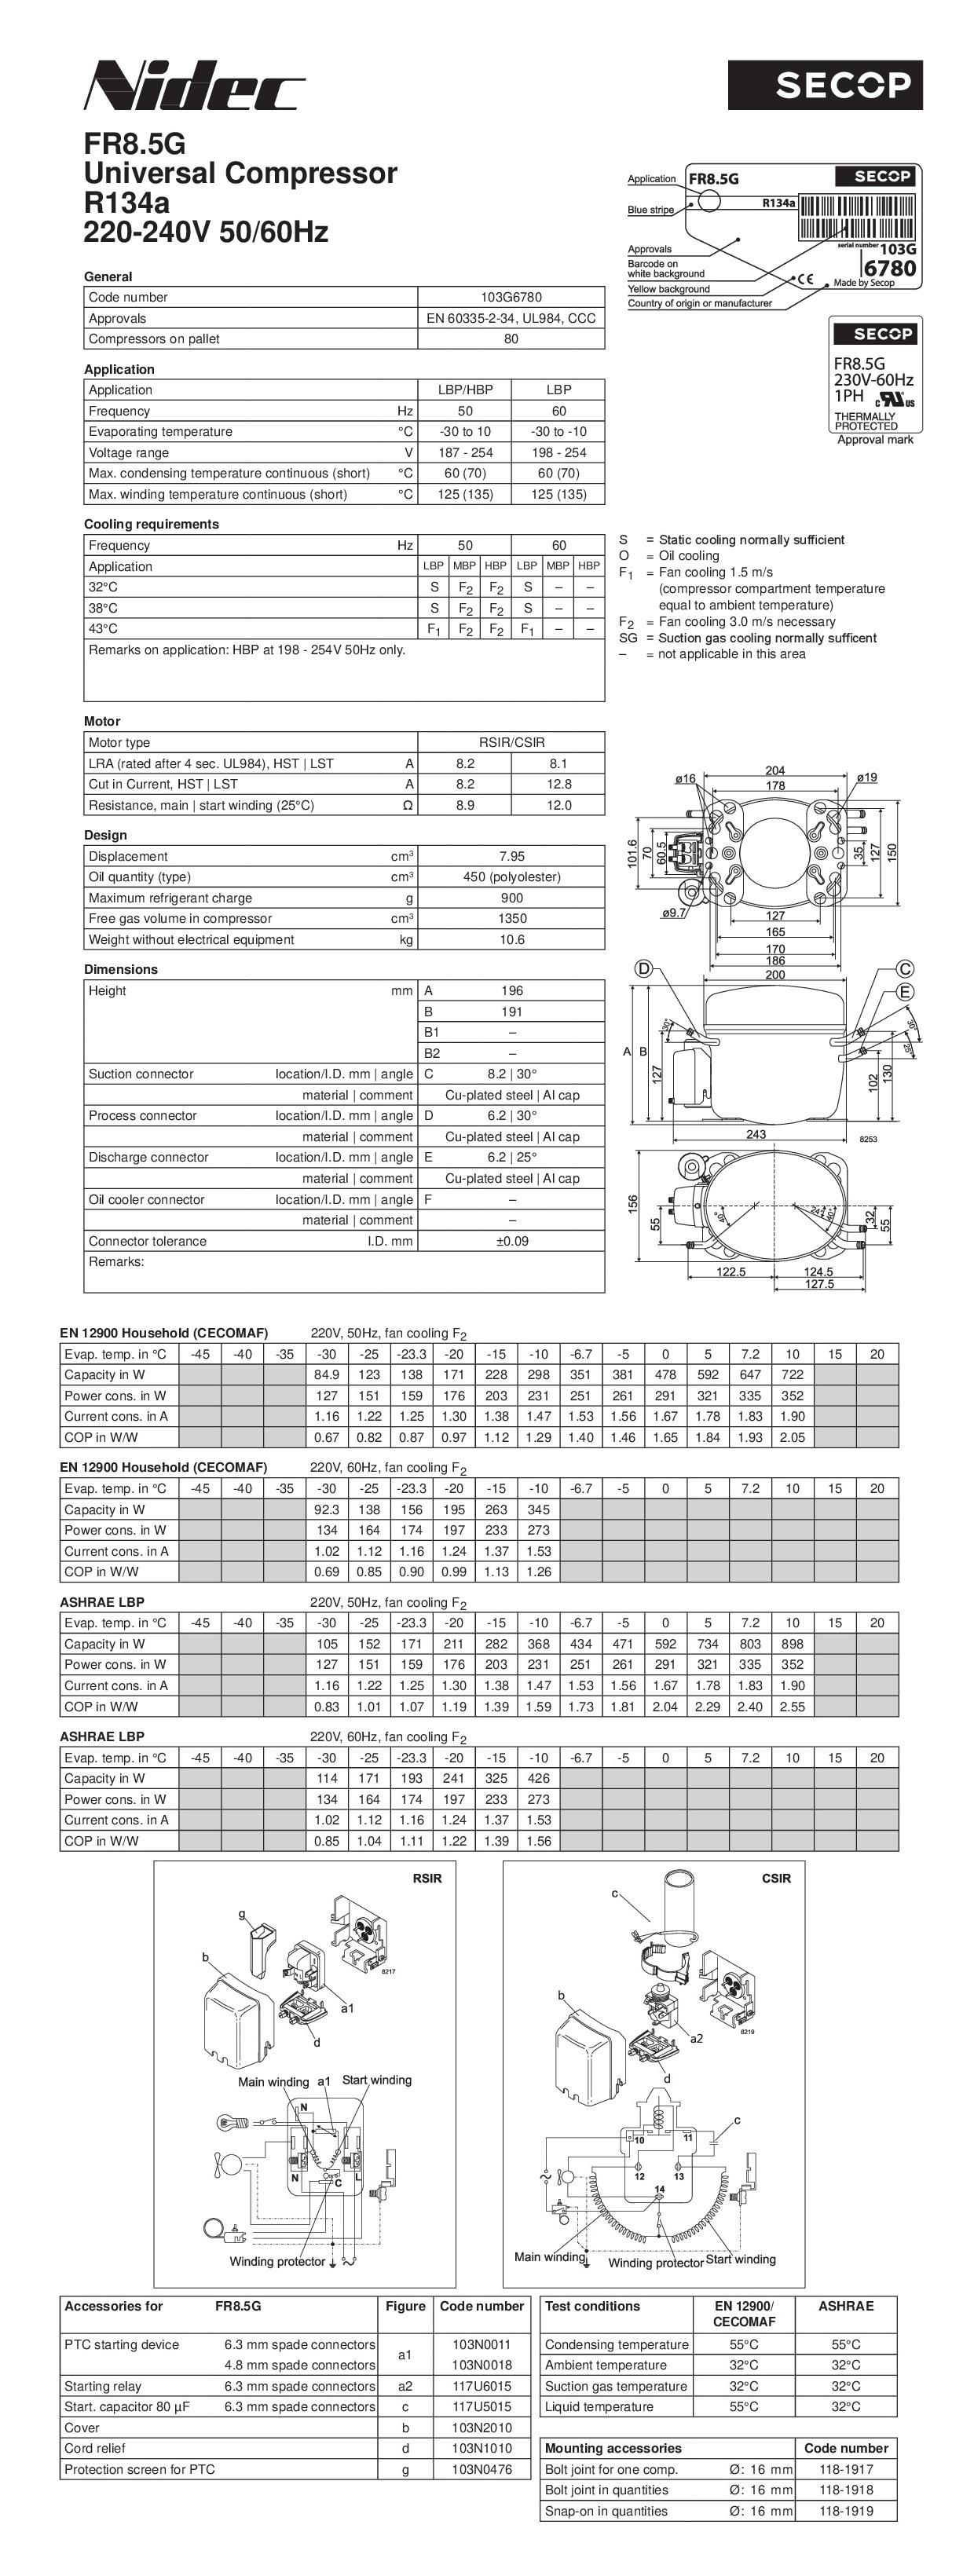 Danfoss Fr8 5g Compressor Wiring Diagram Trusted Diagrams Secop Fr 8 5 G